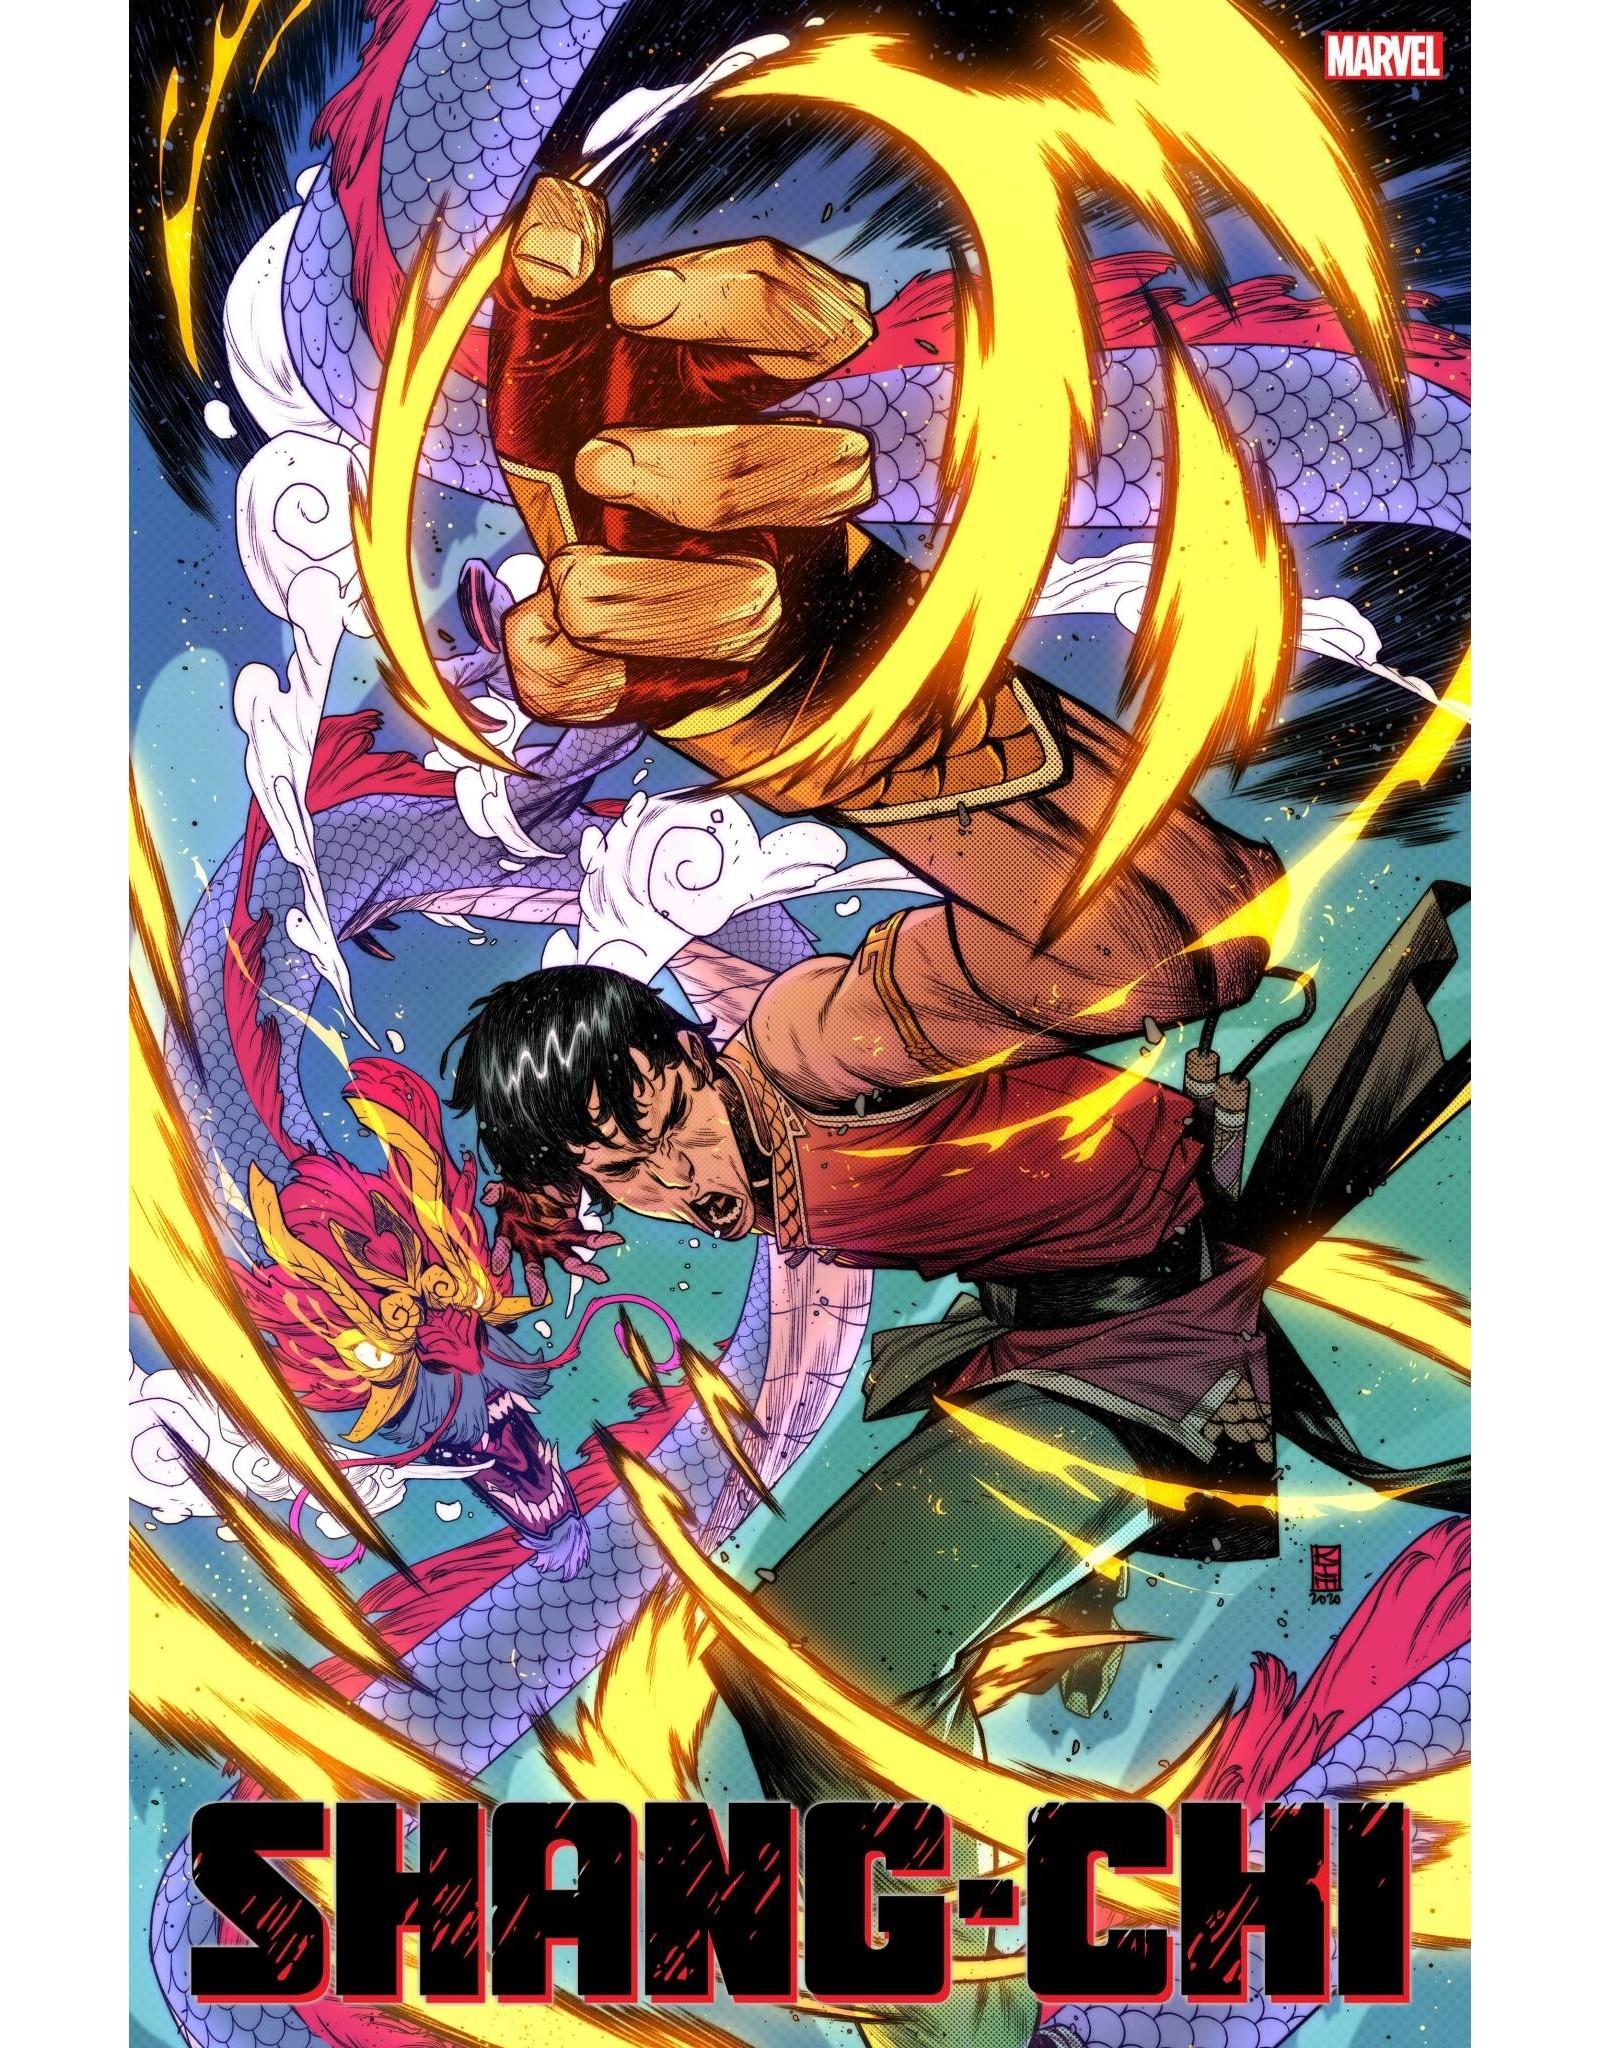 Marvel Comics SHANG-CHI #1 (OF 5) JACINTO VAR